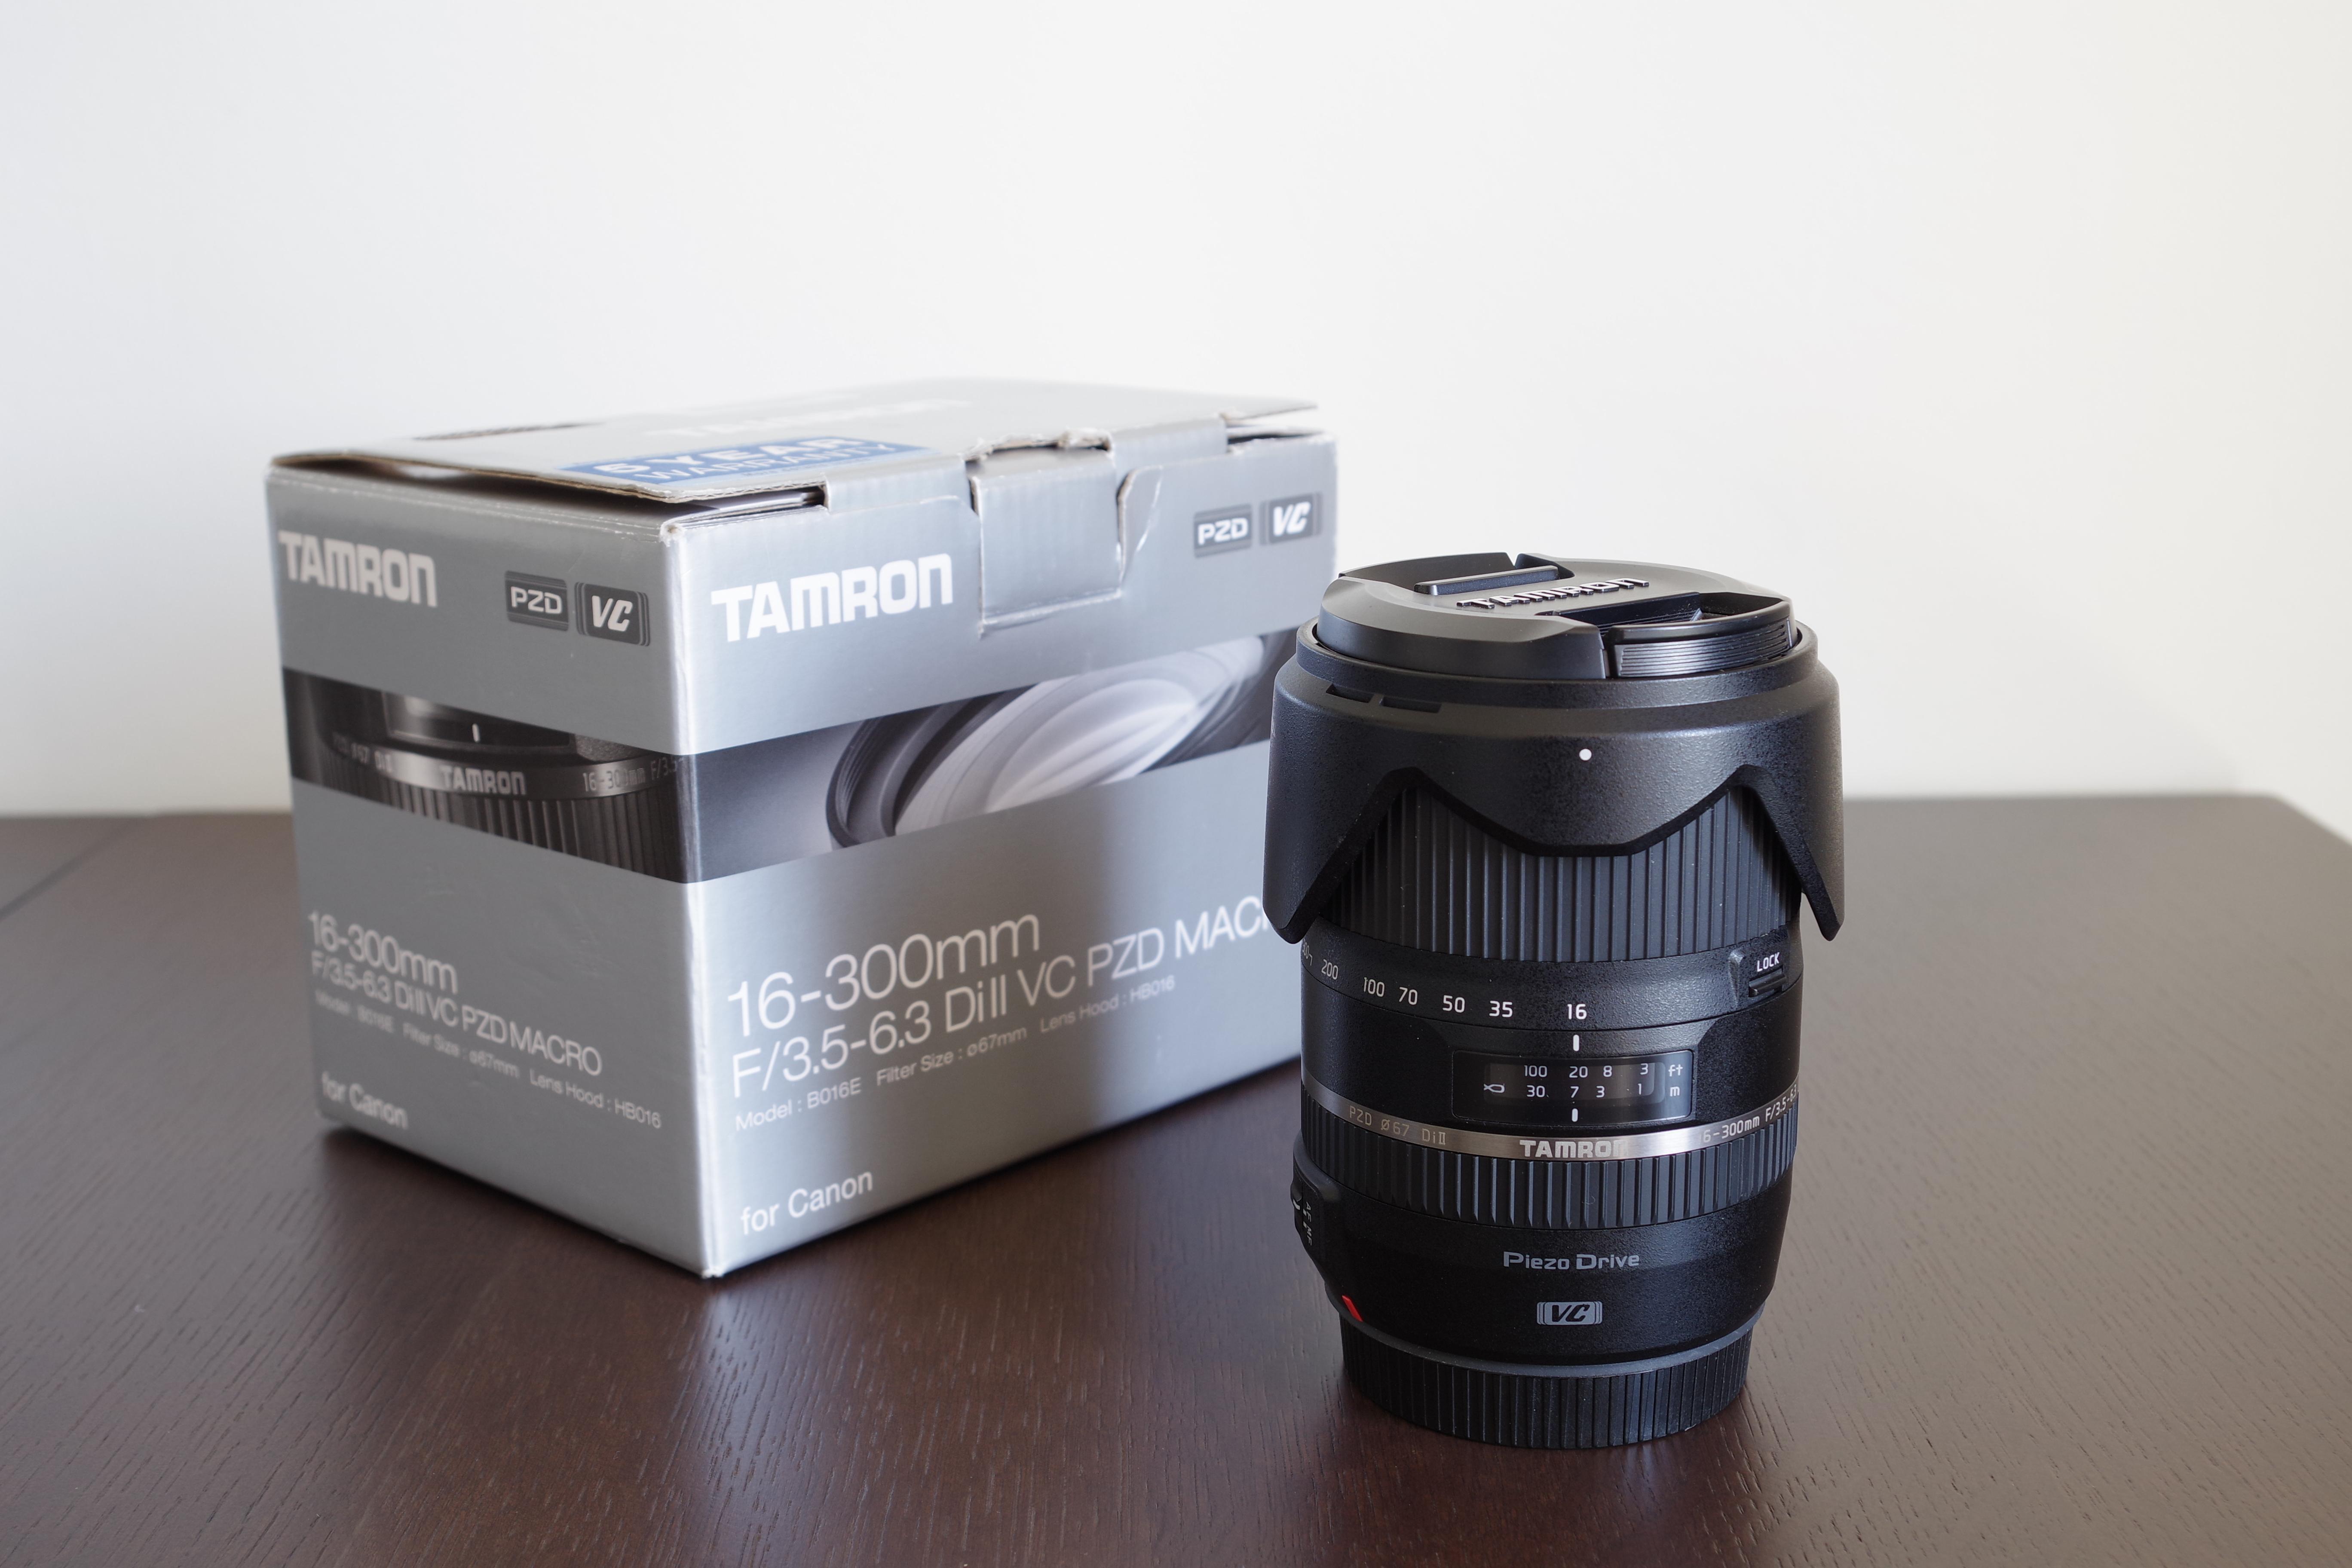 tamron blog 5 reasons for choosing the 16 300mm f 3 5 6 3 di ii vc pzd macro lens. Black Bedroom Furniture Sets. Home Design Ideas